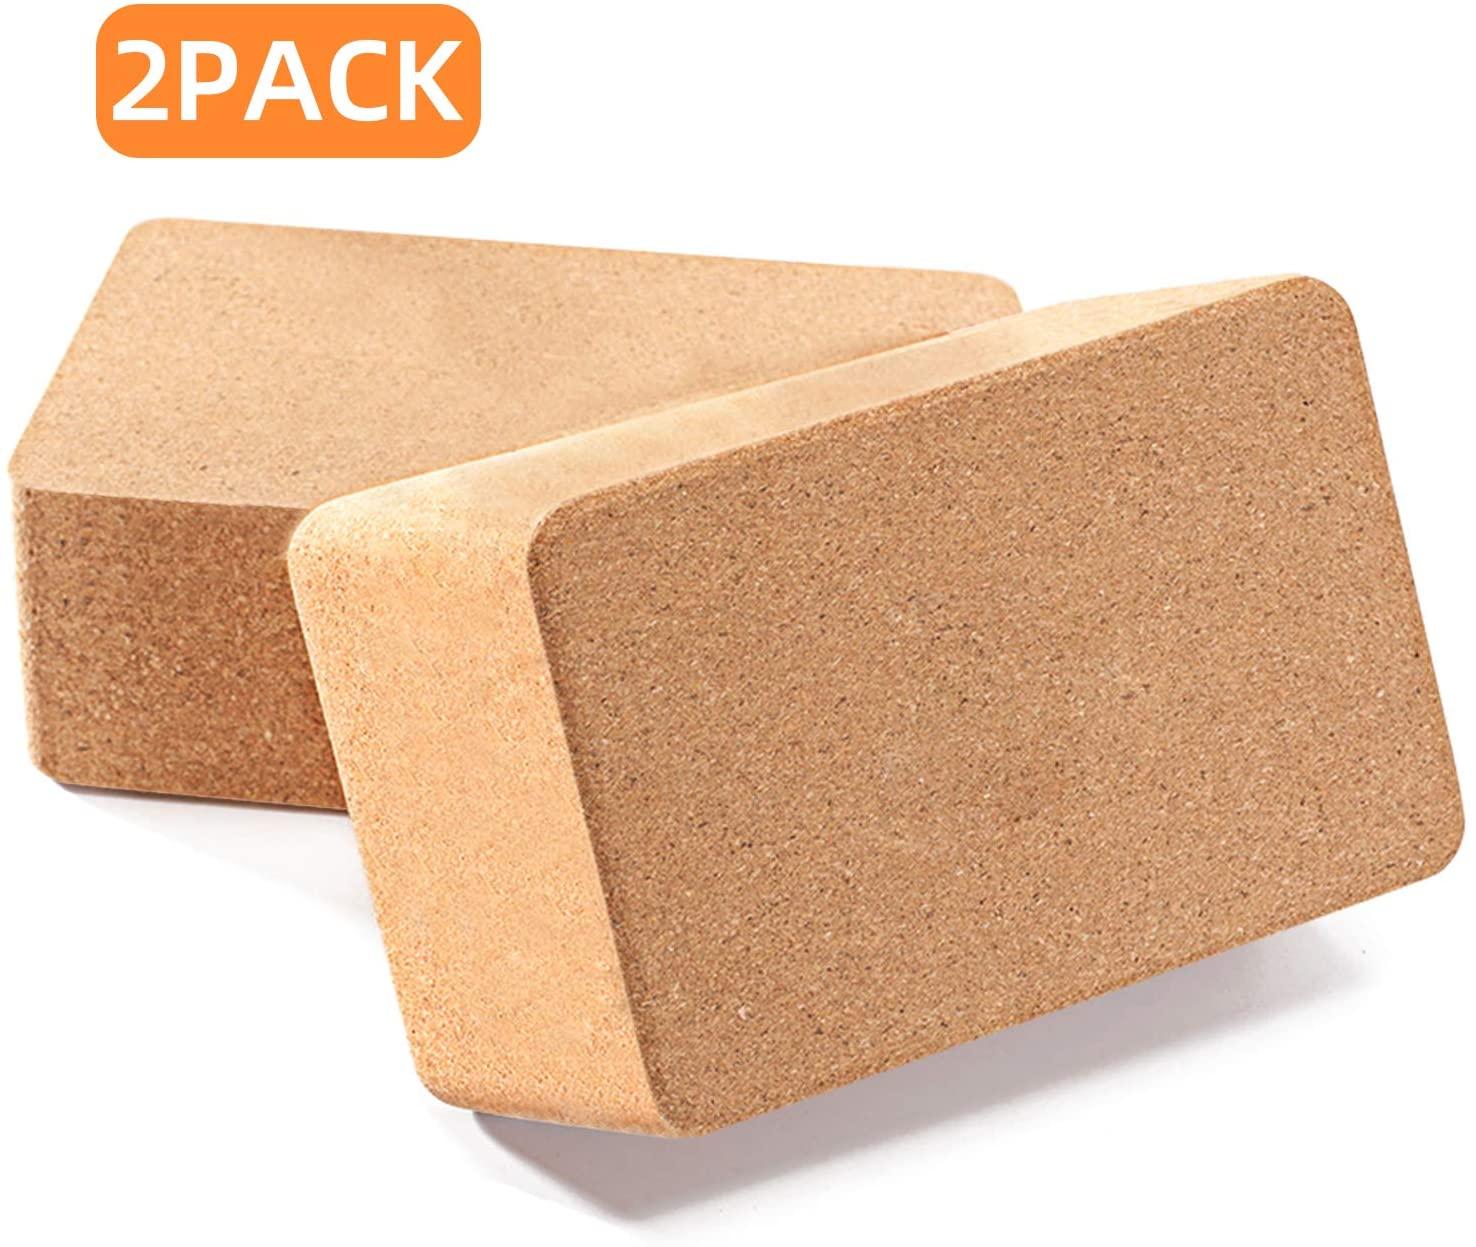 Huryfox 2 Packs Cork Yoga Block, Non-Slip Exercise Brick Premium High Density Wood Yoga Bricks, Fitness Brick for Women & Men, Pilates, Training, Meditation, Gym, Home (9x6x3)